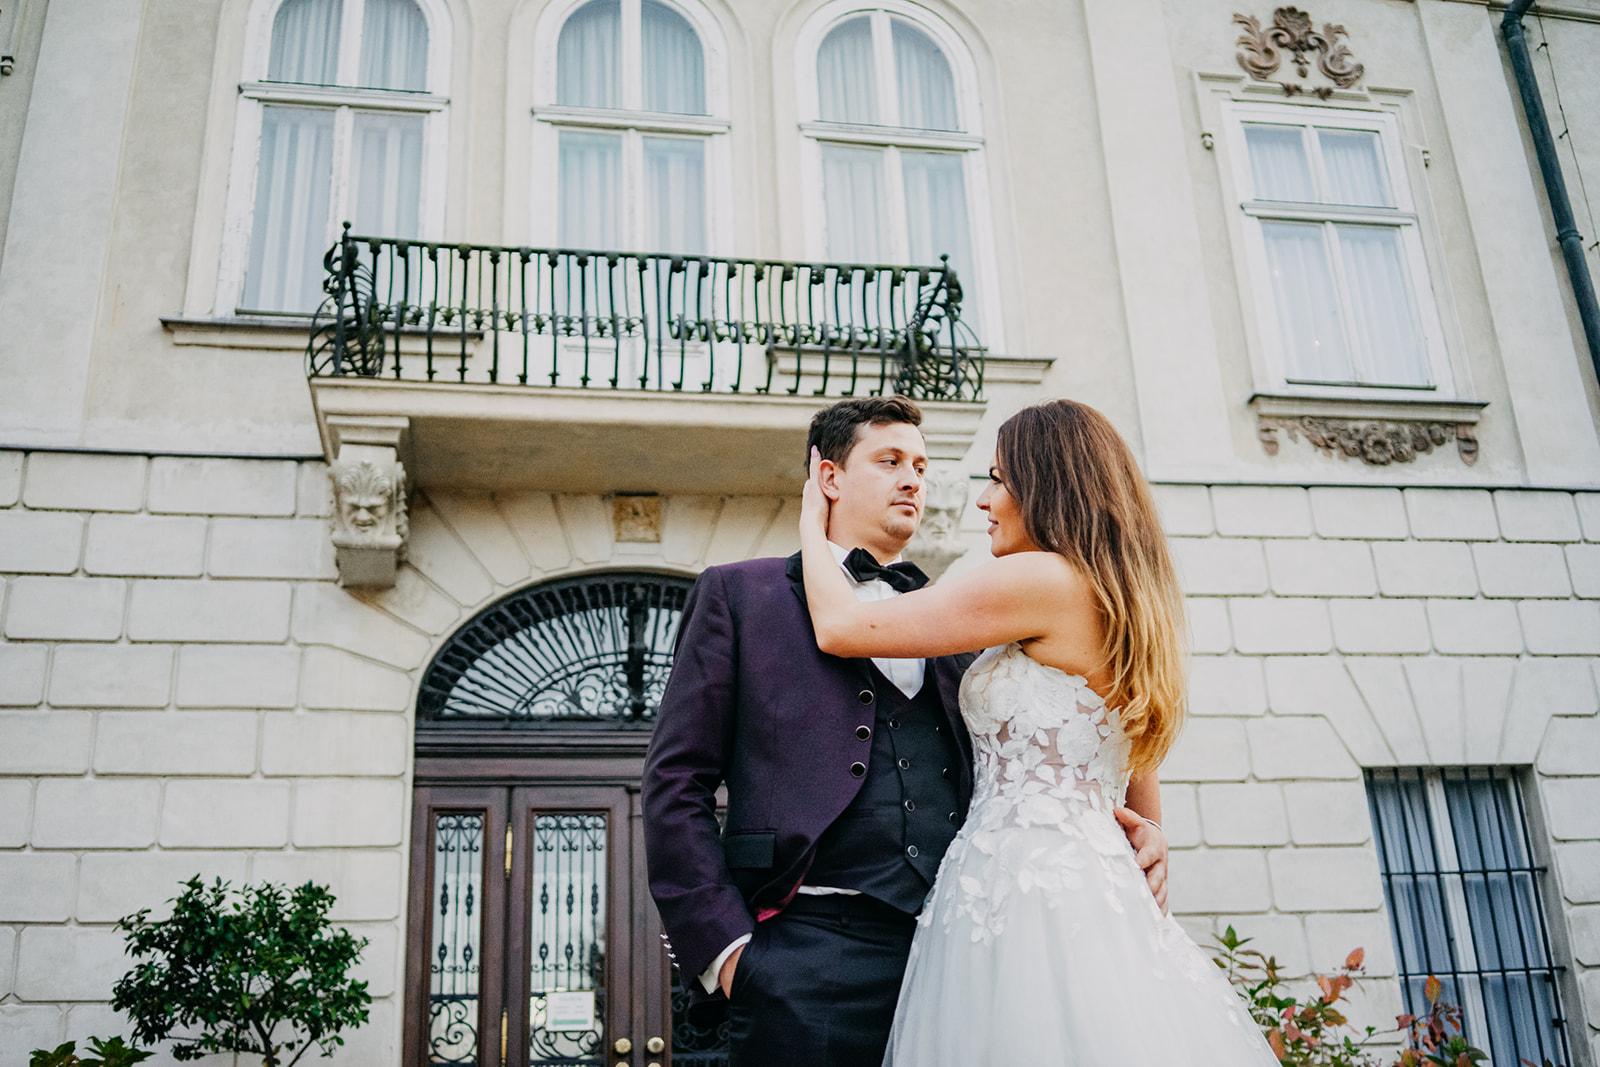 fotograf na wesele łódź